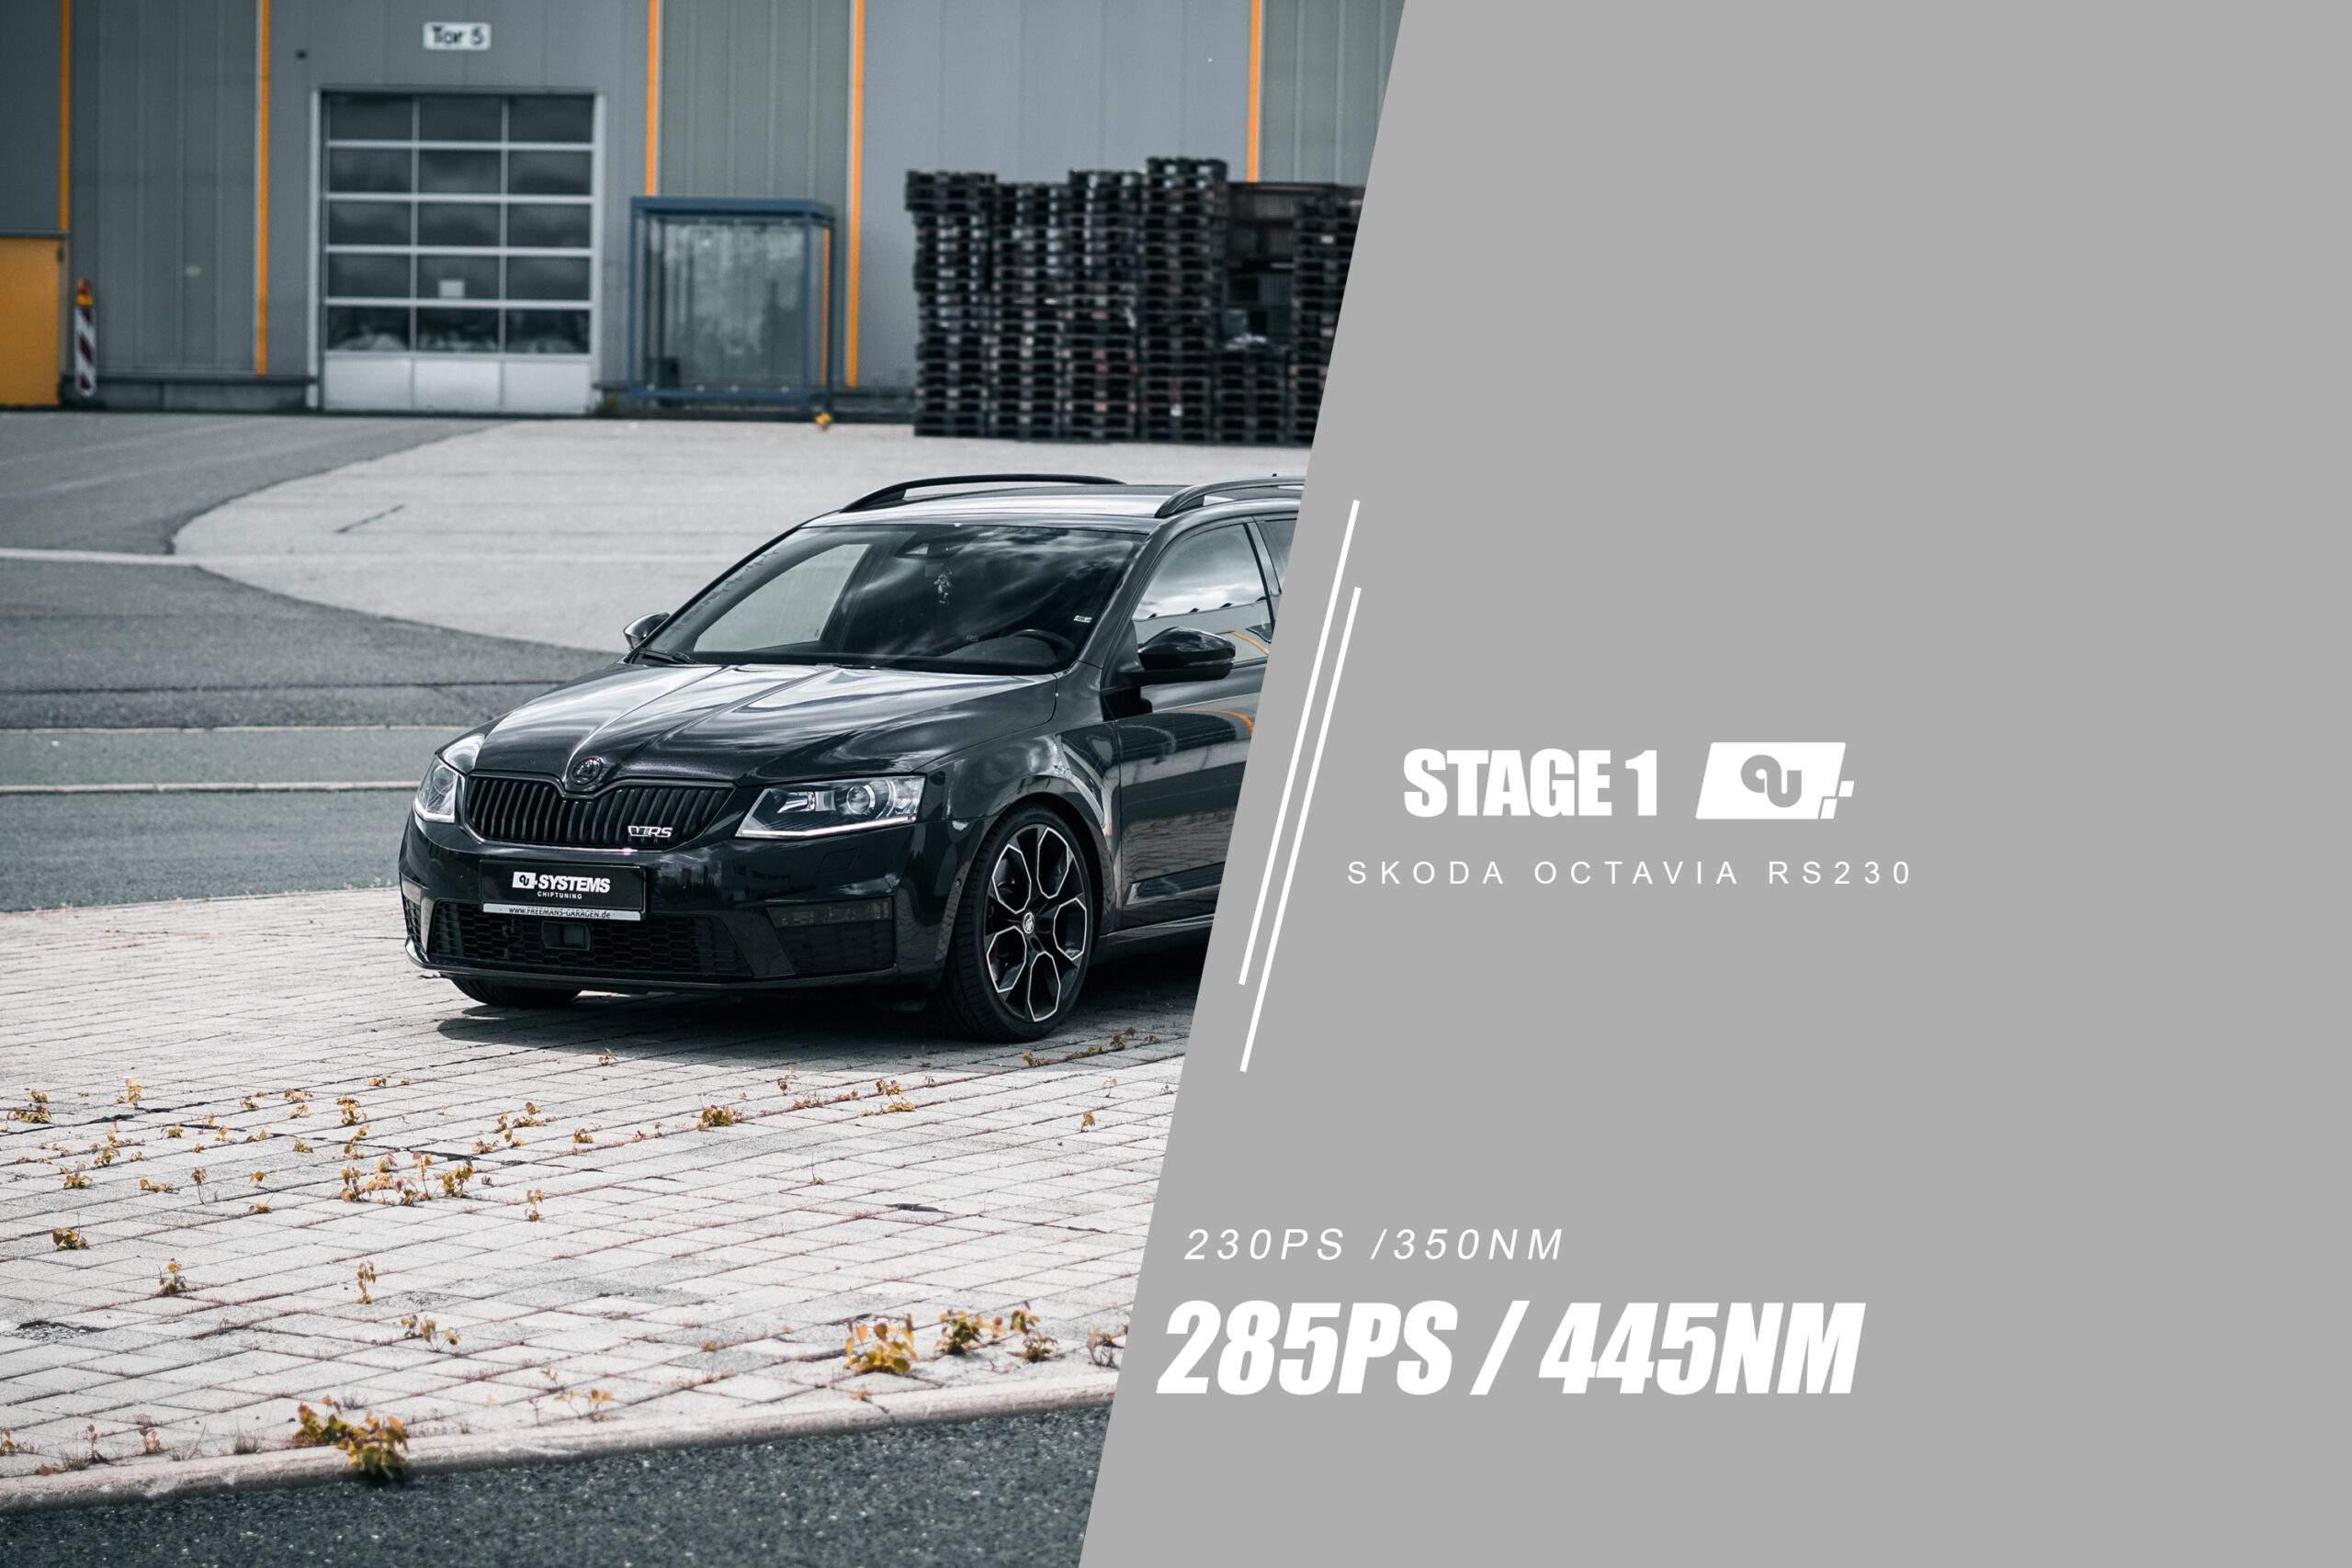 Stage 1 Optimierung Skoda Octavia RS230